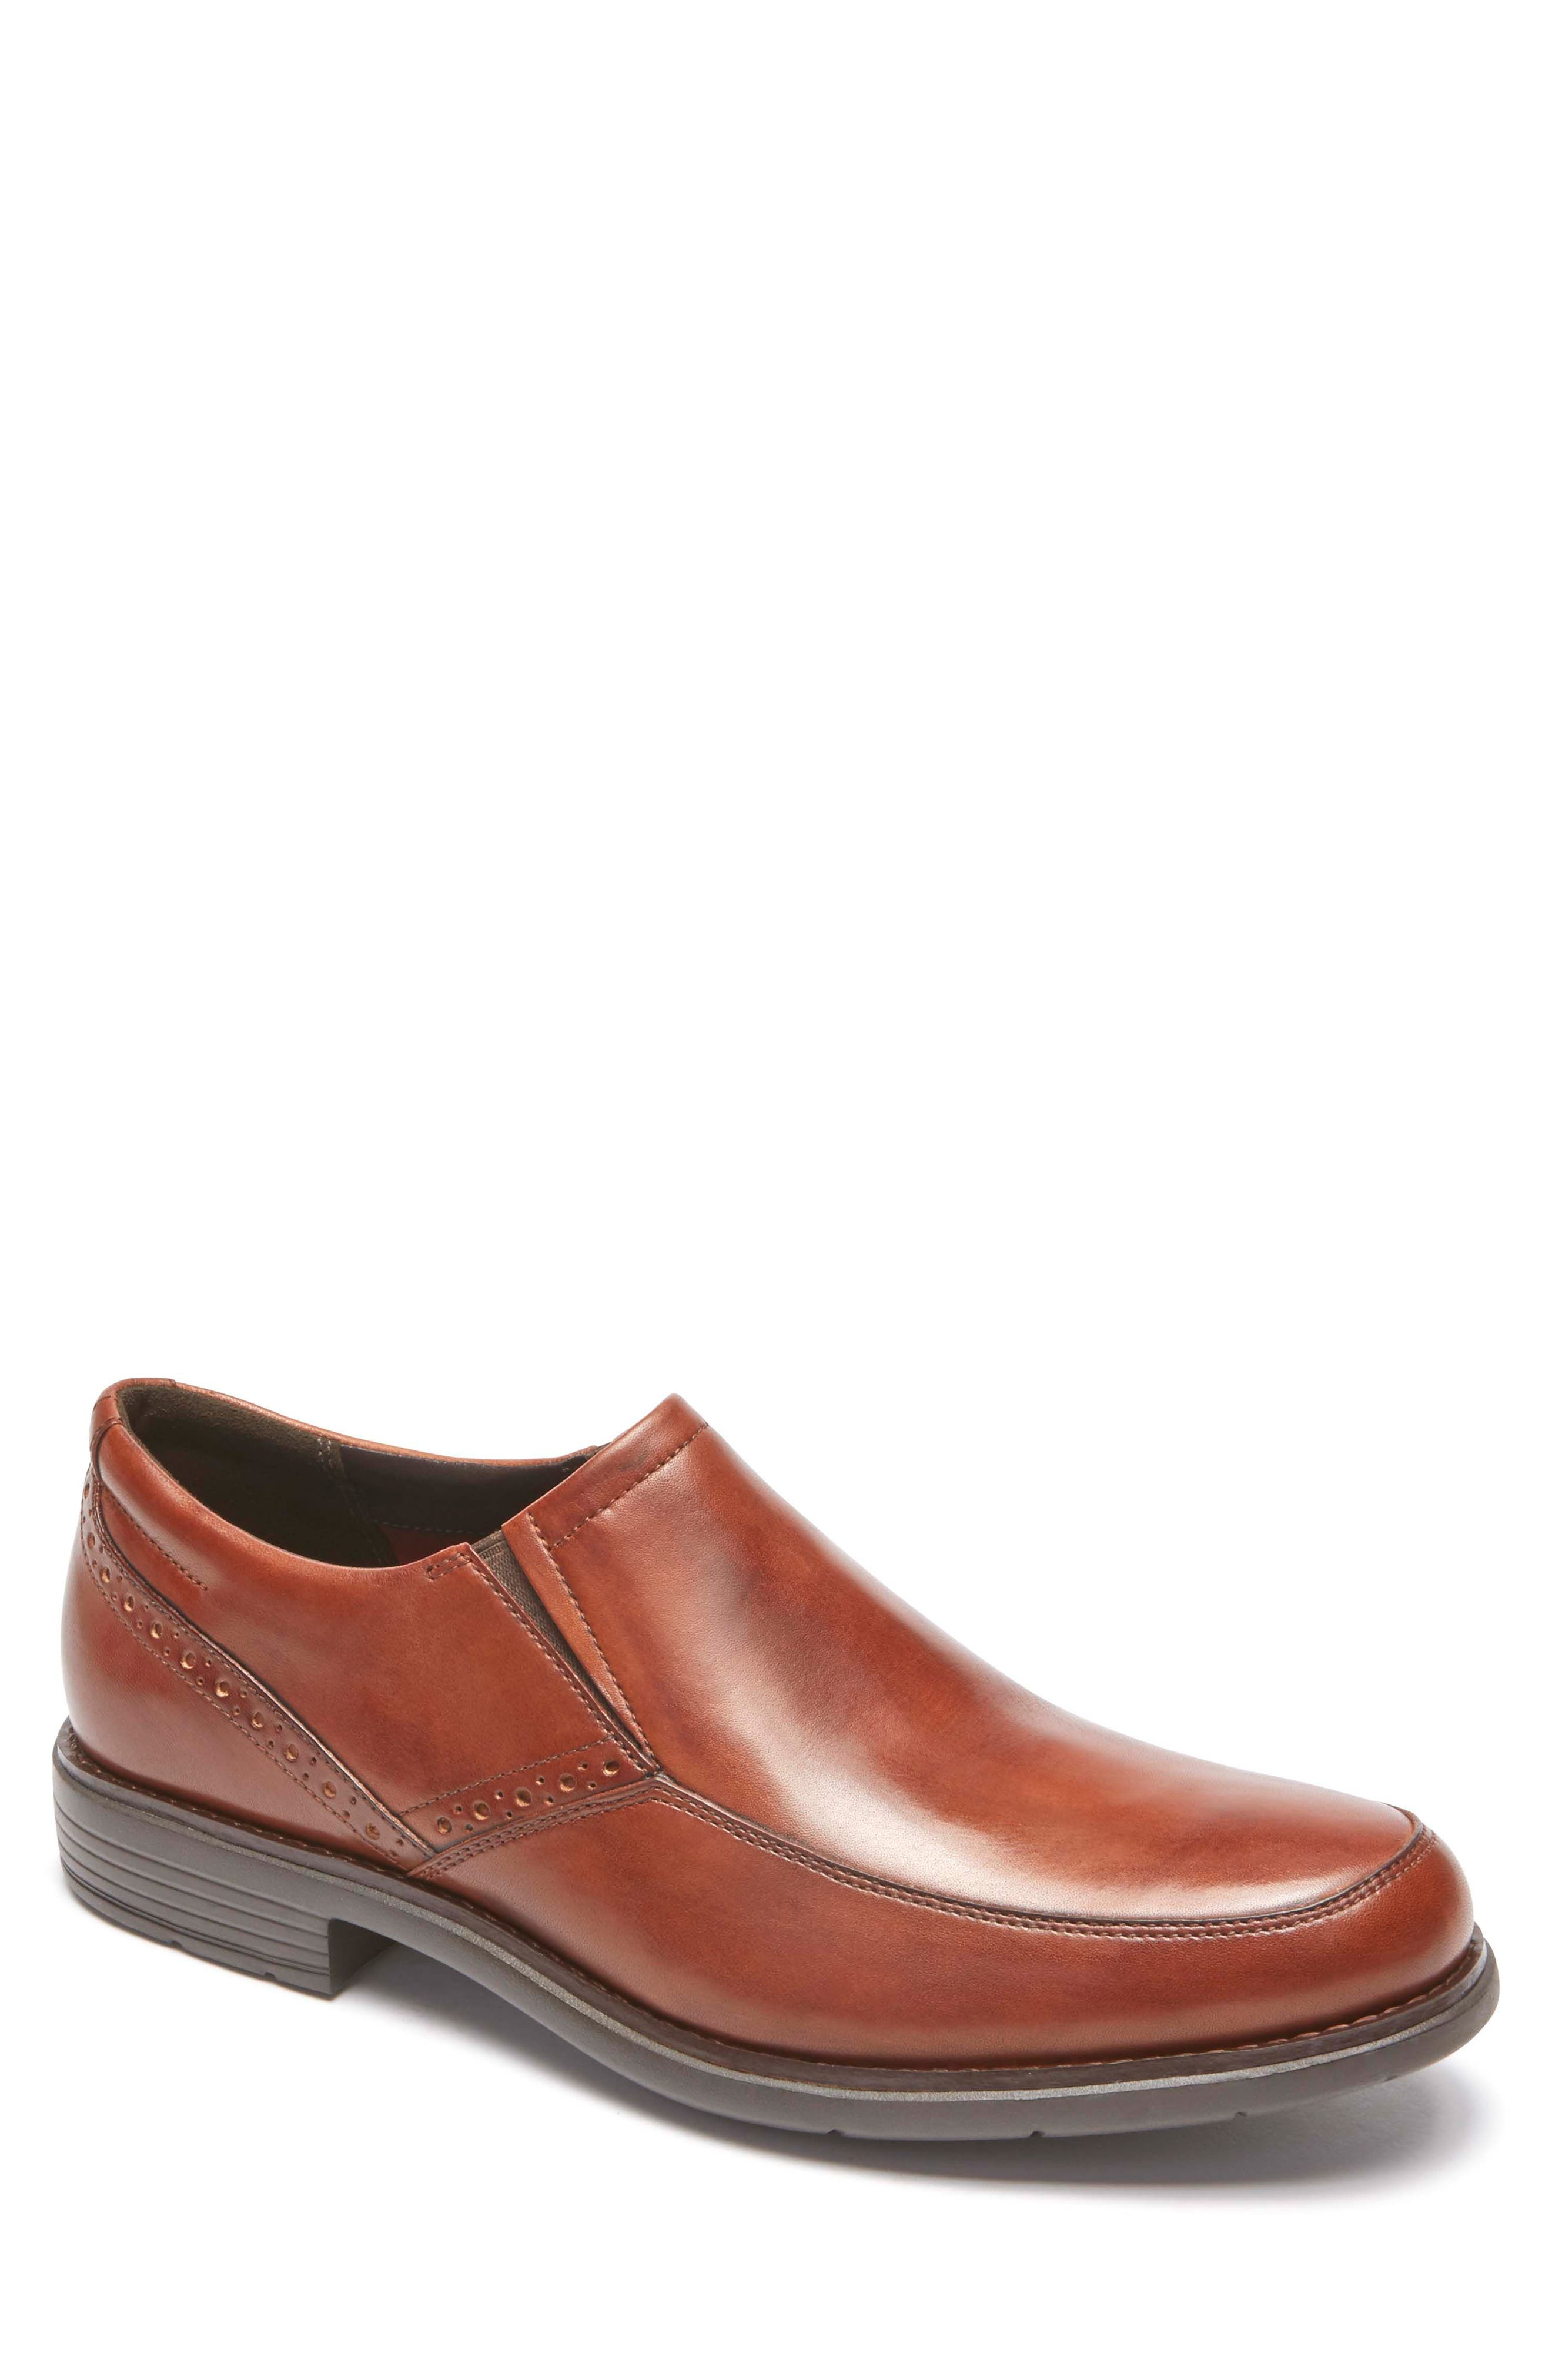 Rockport Total Motion Classic Dress Venetian Loafer (Men)